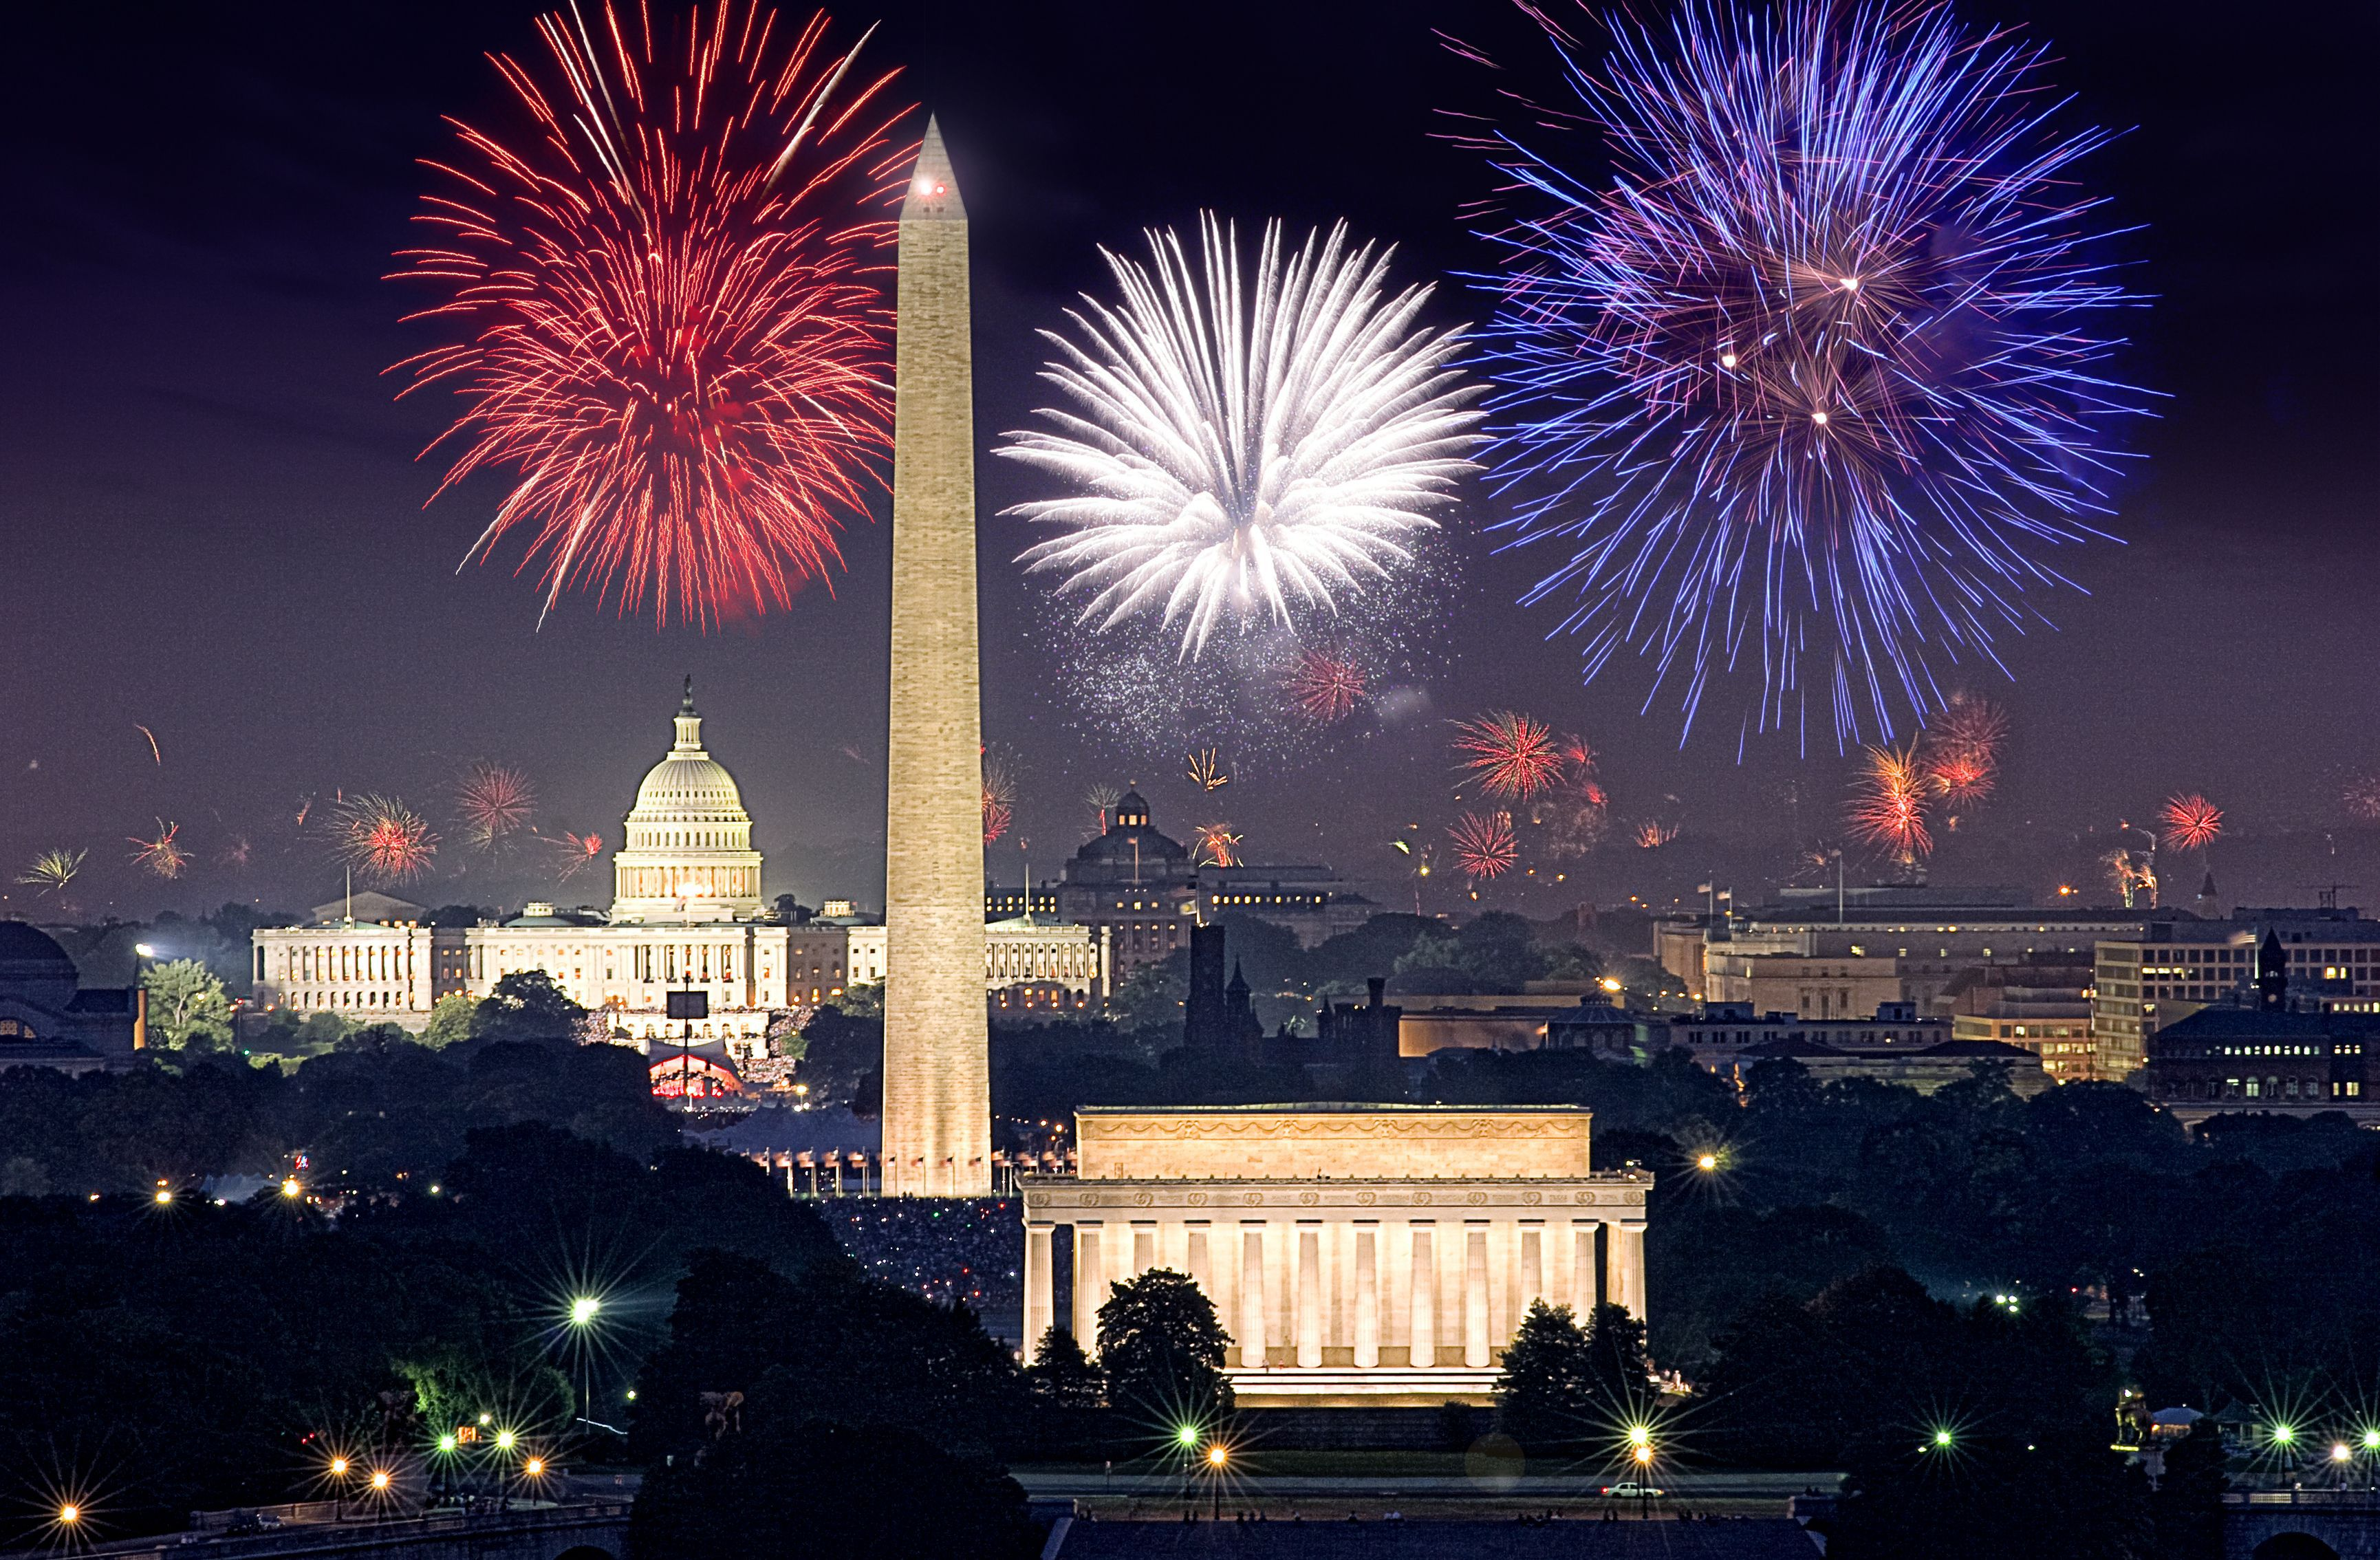 Fireworks in Washington, DC